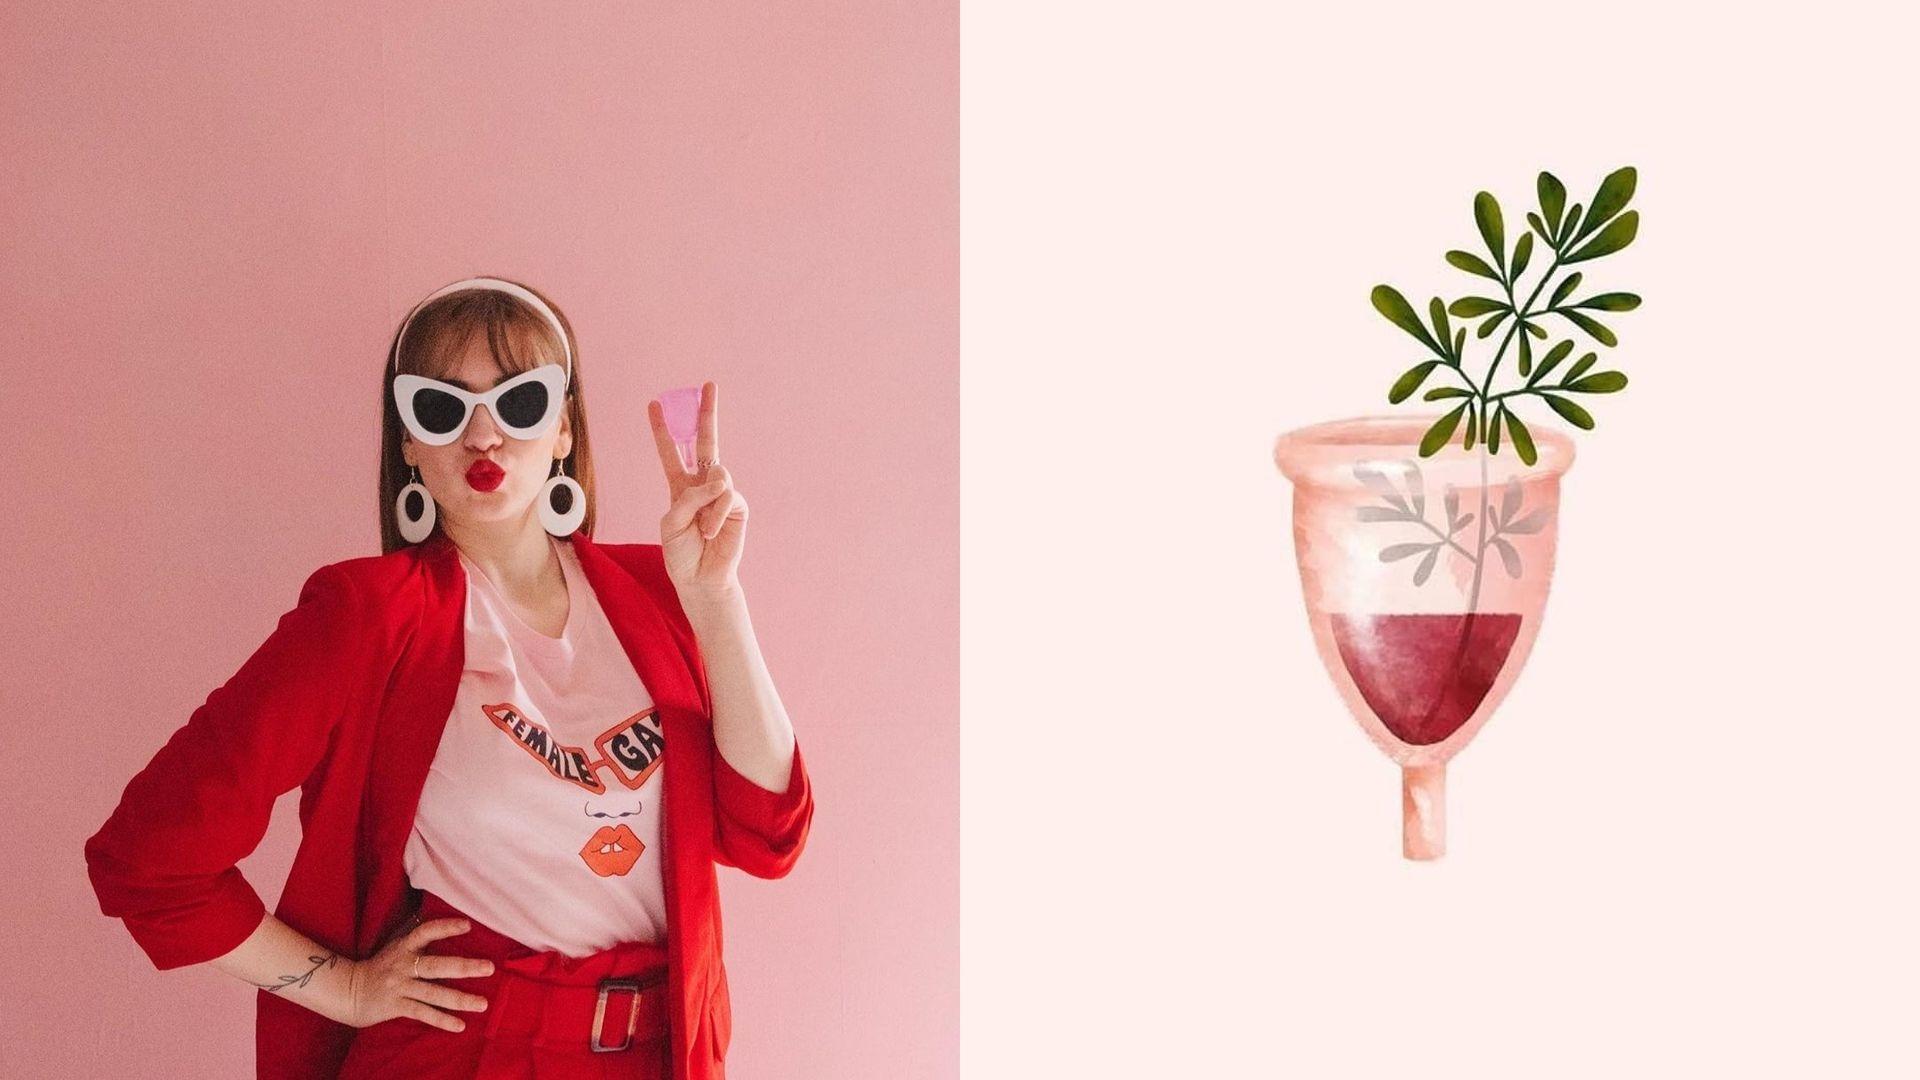 Eco-Friendly Woman's Healthcare: Menstrual Cups